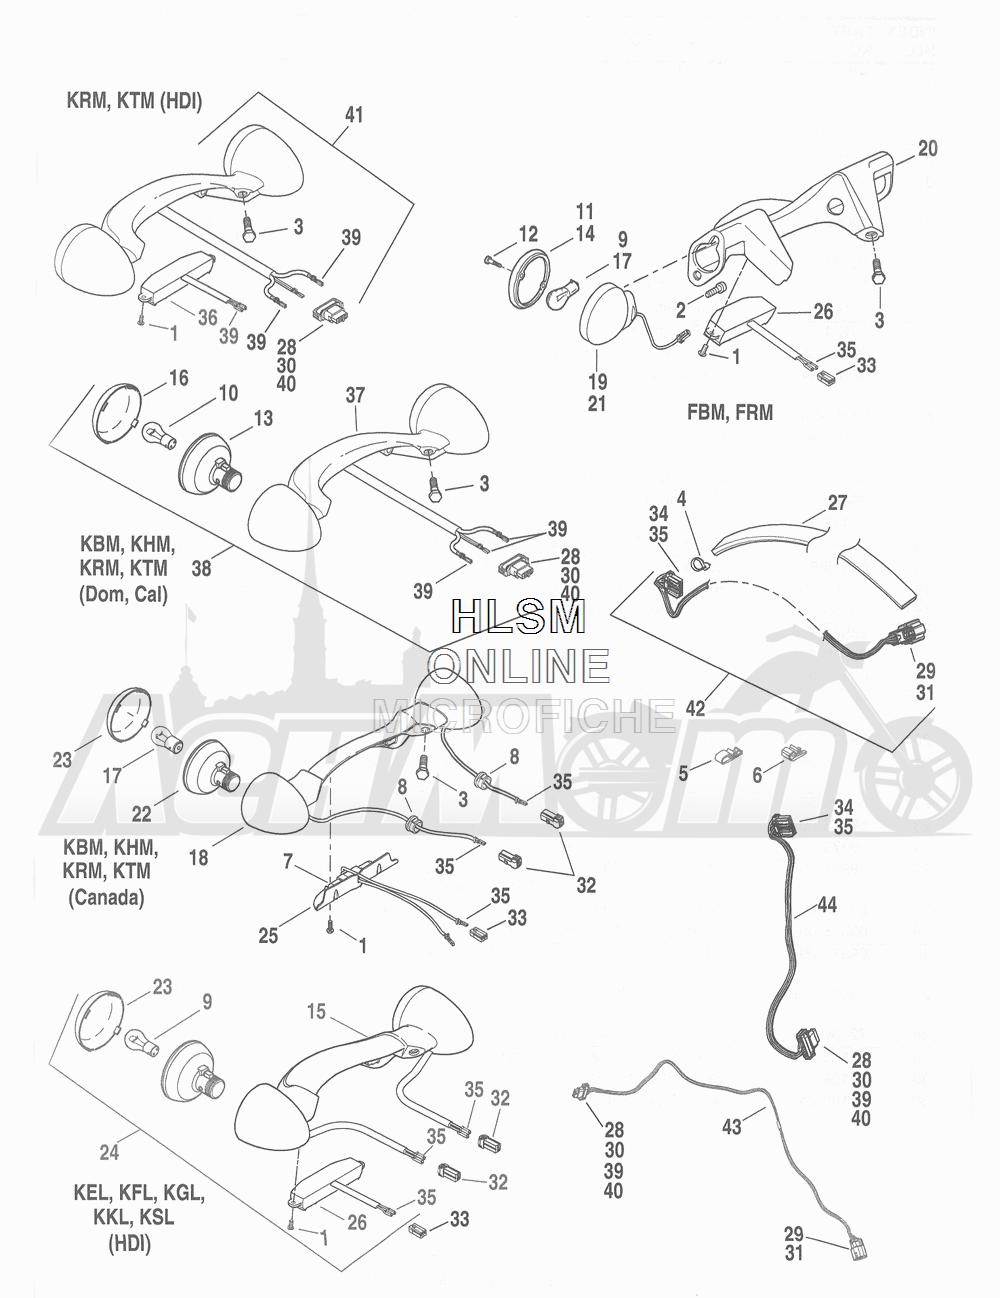 Запчасти для Мотоцикла Harley-Davidson 2016 FLHRC ROAD KING CLASSIC (FRM) Раздел: TURN SIGNALS - REAR W/ TAIL LIGHT - REAR | сигналы поворота зад вместе с задний фонарь зад